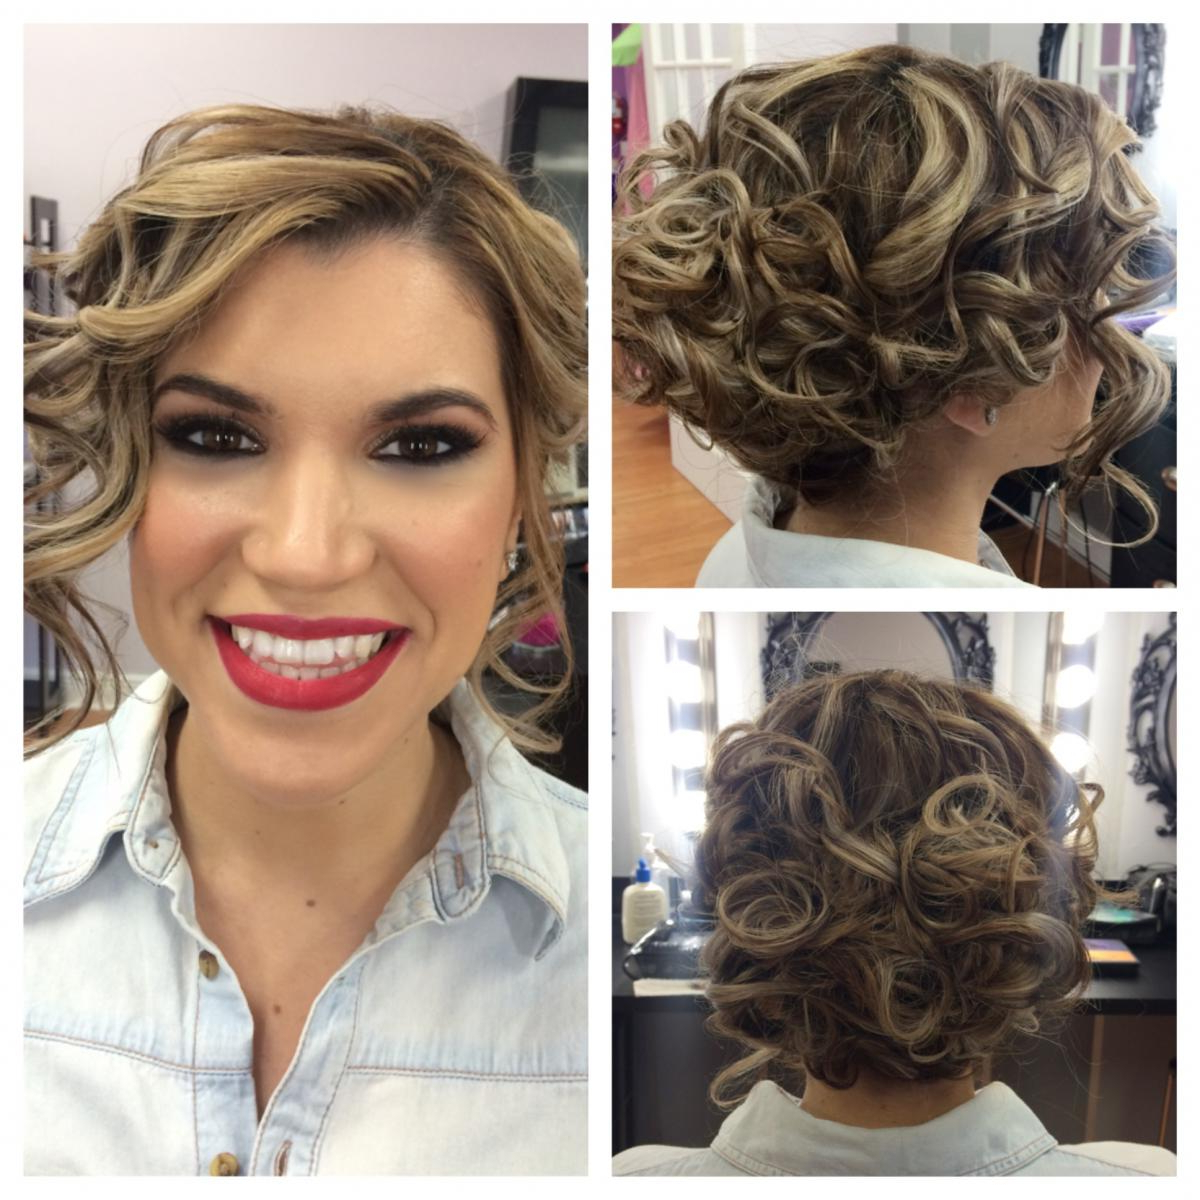 Short Hair Style Wedding Bridal Makeup Bridesmaid Hairstyles With Short Hairstyles For Weddings For Bridesmaids (View 17 of 25)